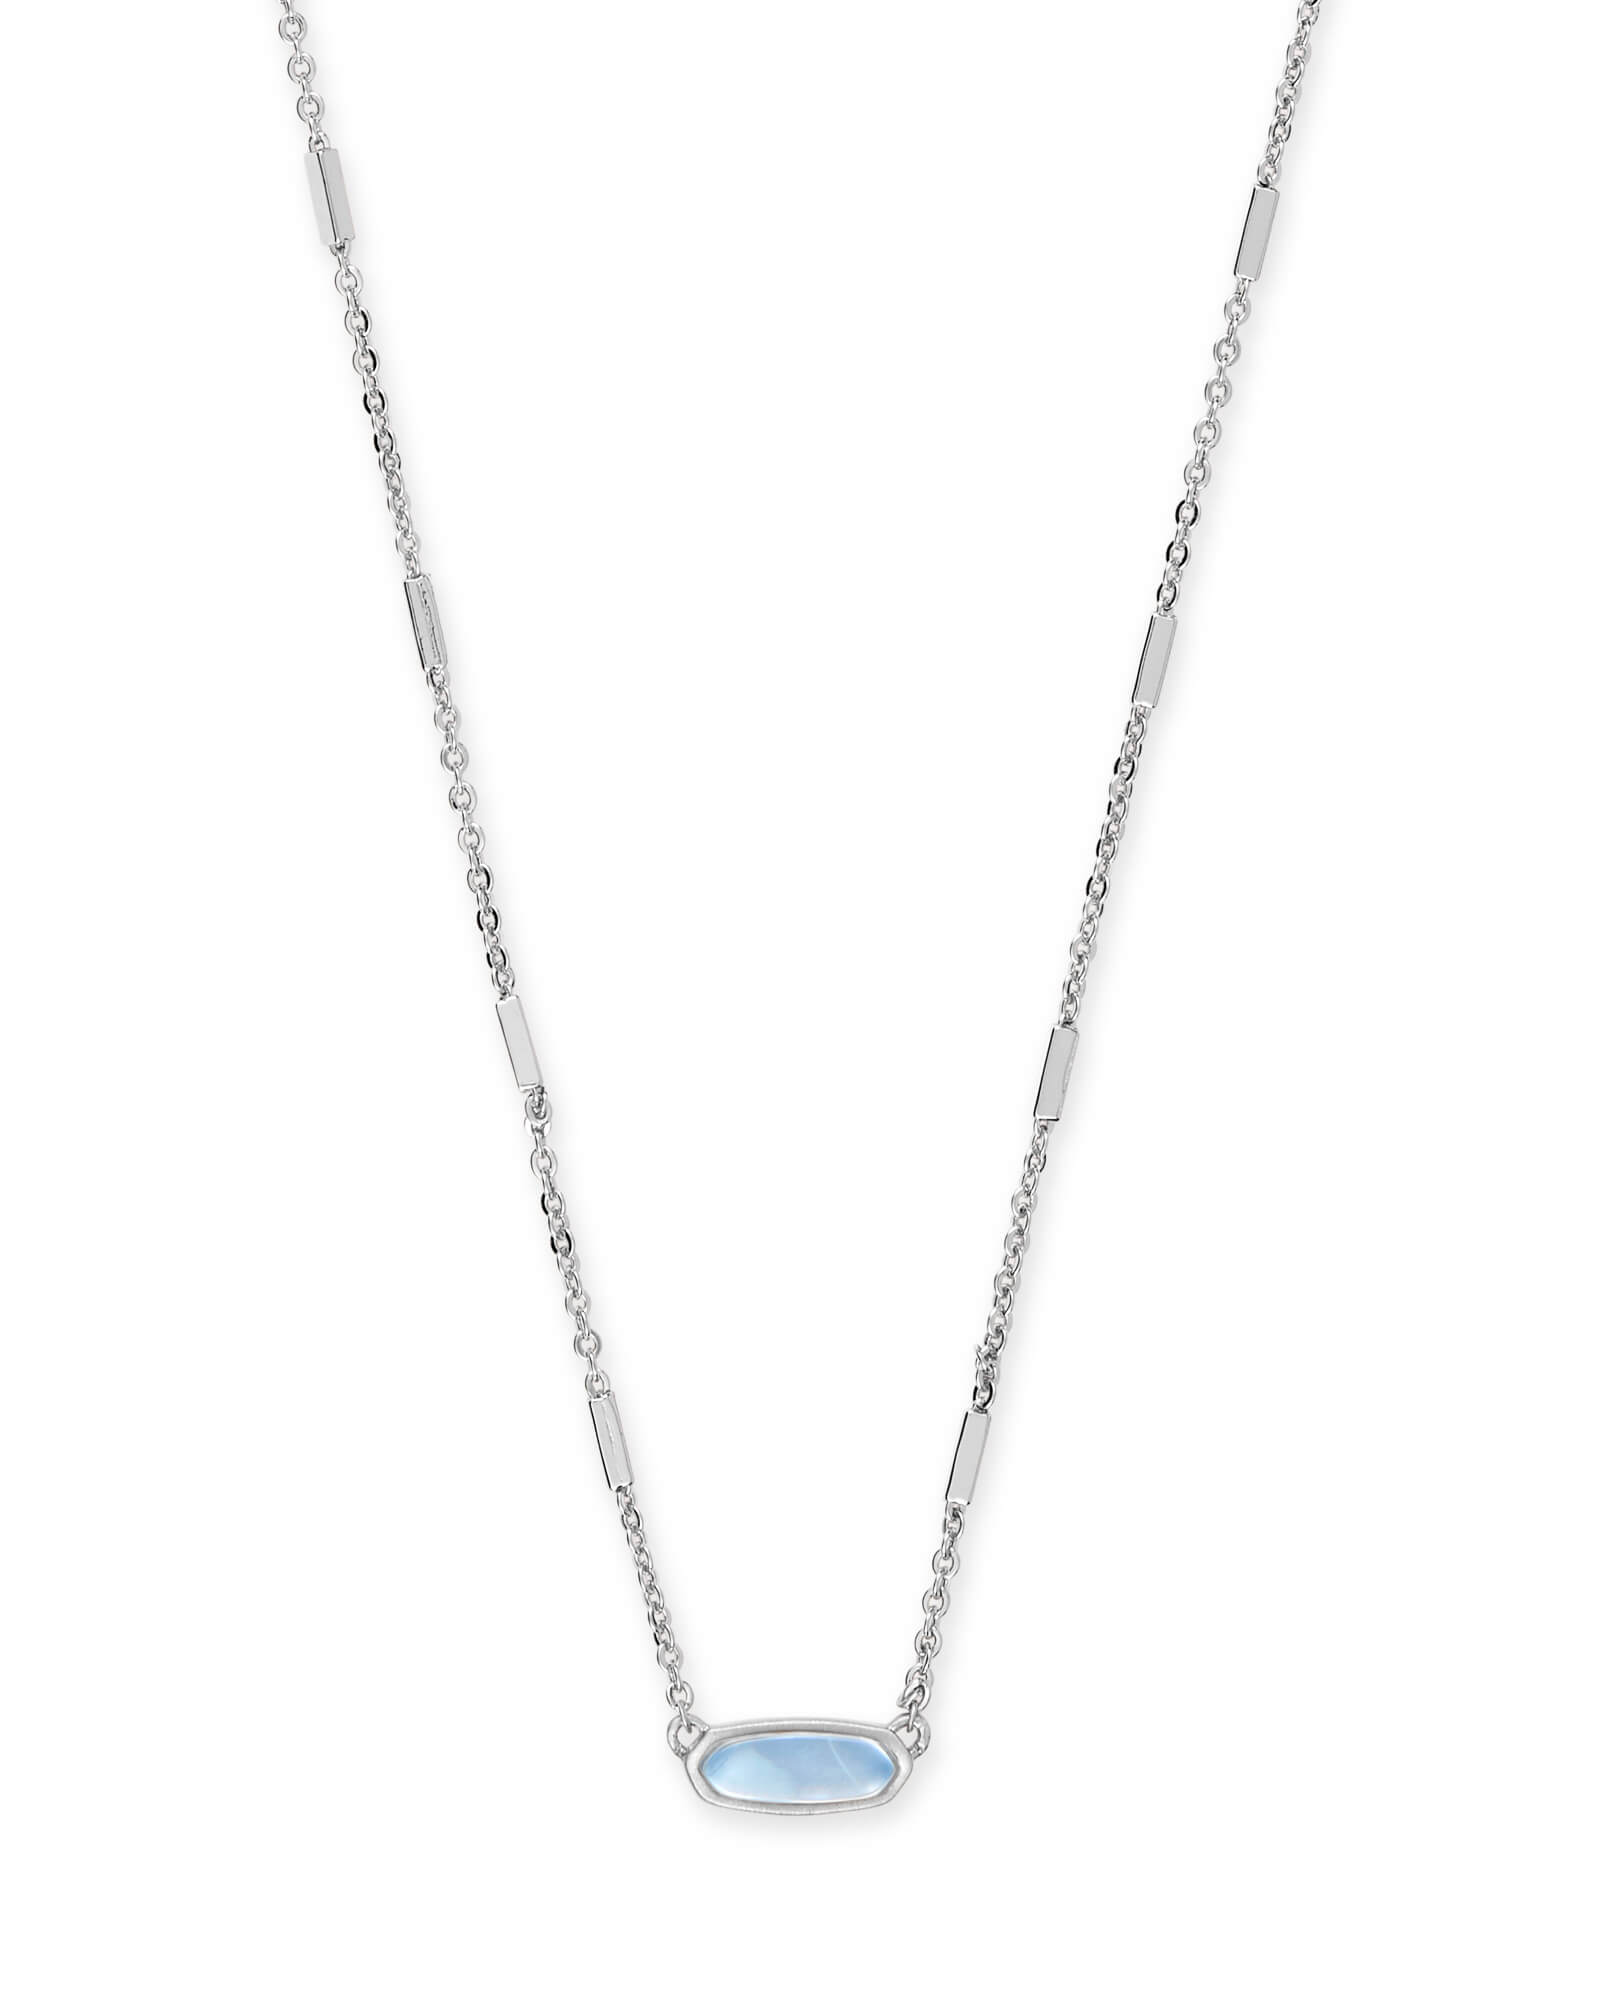 f4bae212ea021 Miya Bright Silver Pendant Necklace in Sky Blue Illusion